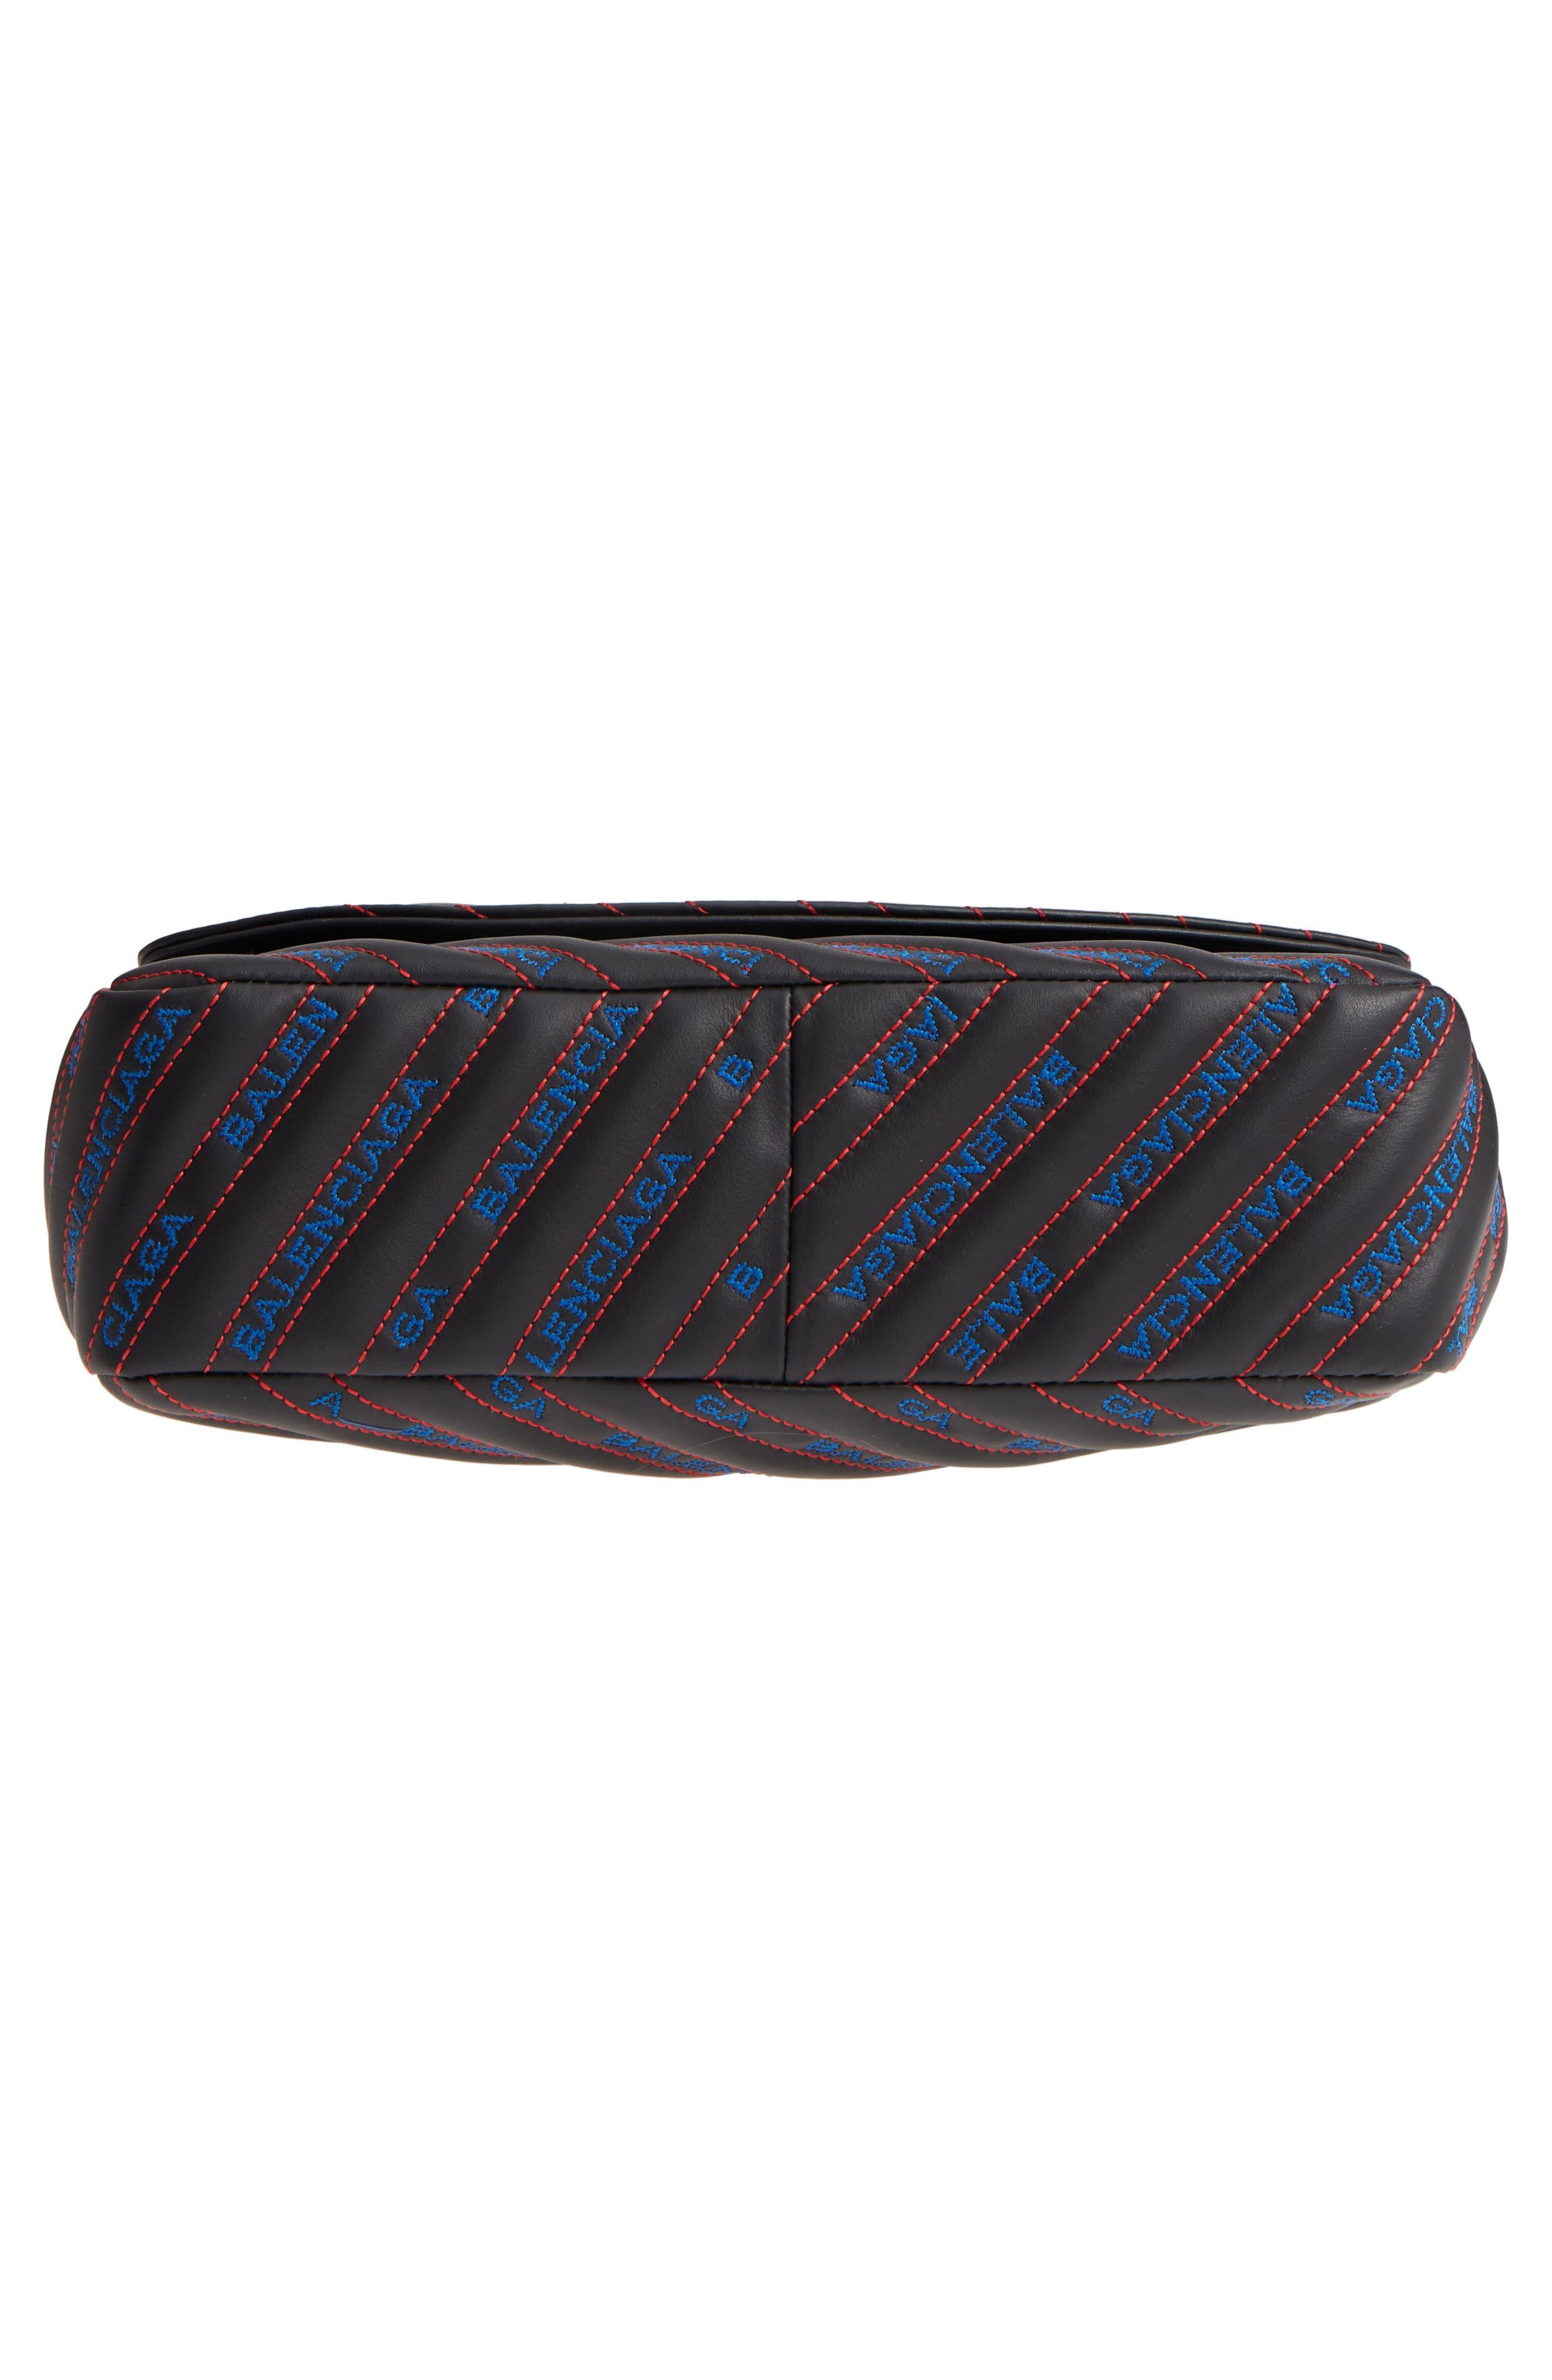 Medium BB Round Logo Charm Crossbody Bag,                             Alternate thumbnail 6, color,                             Noir/ Bleu/ Rouge